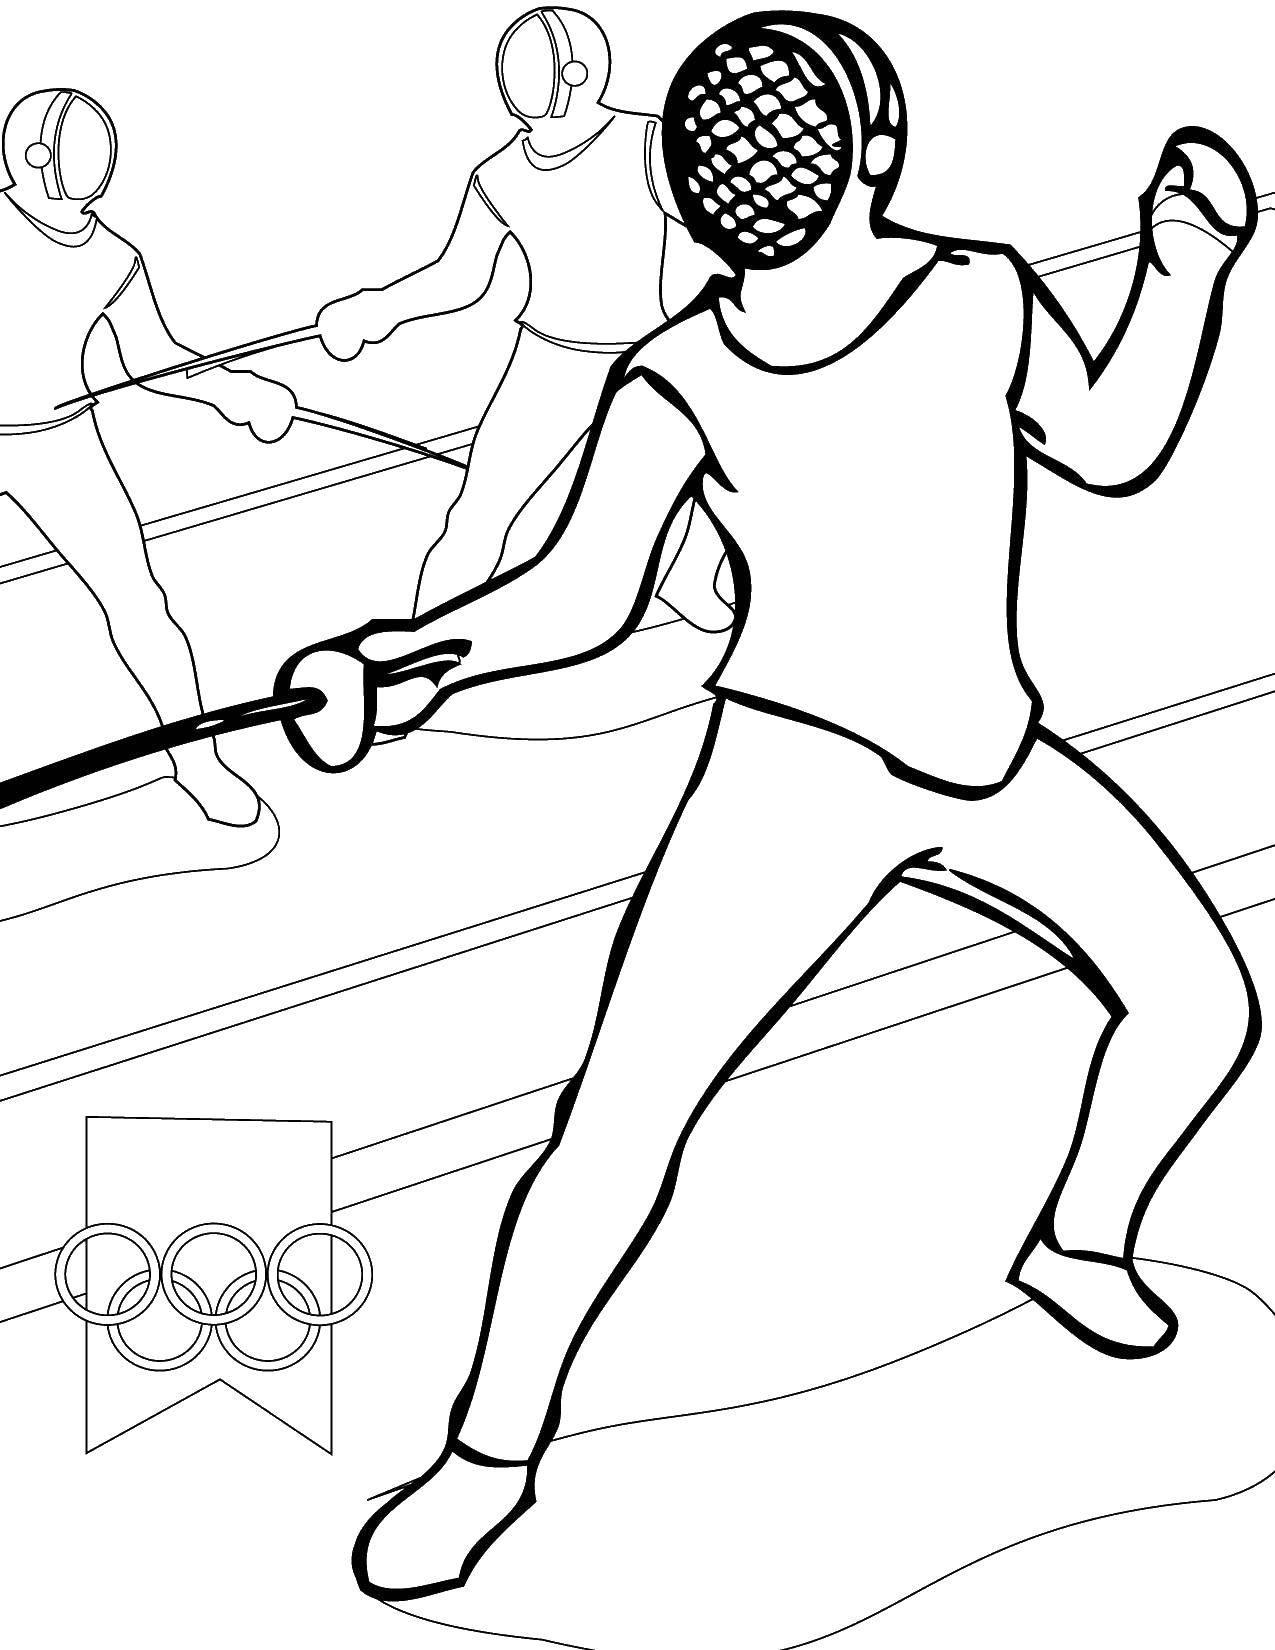 Картинки карандашом по теме спорт